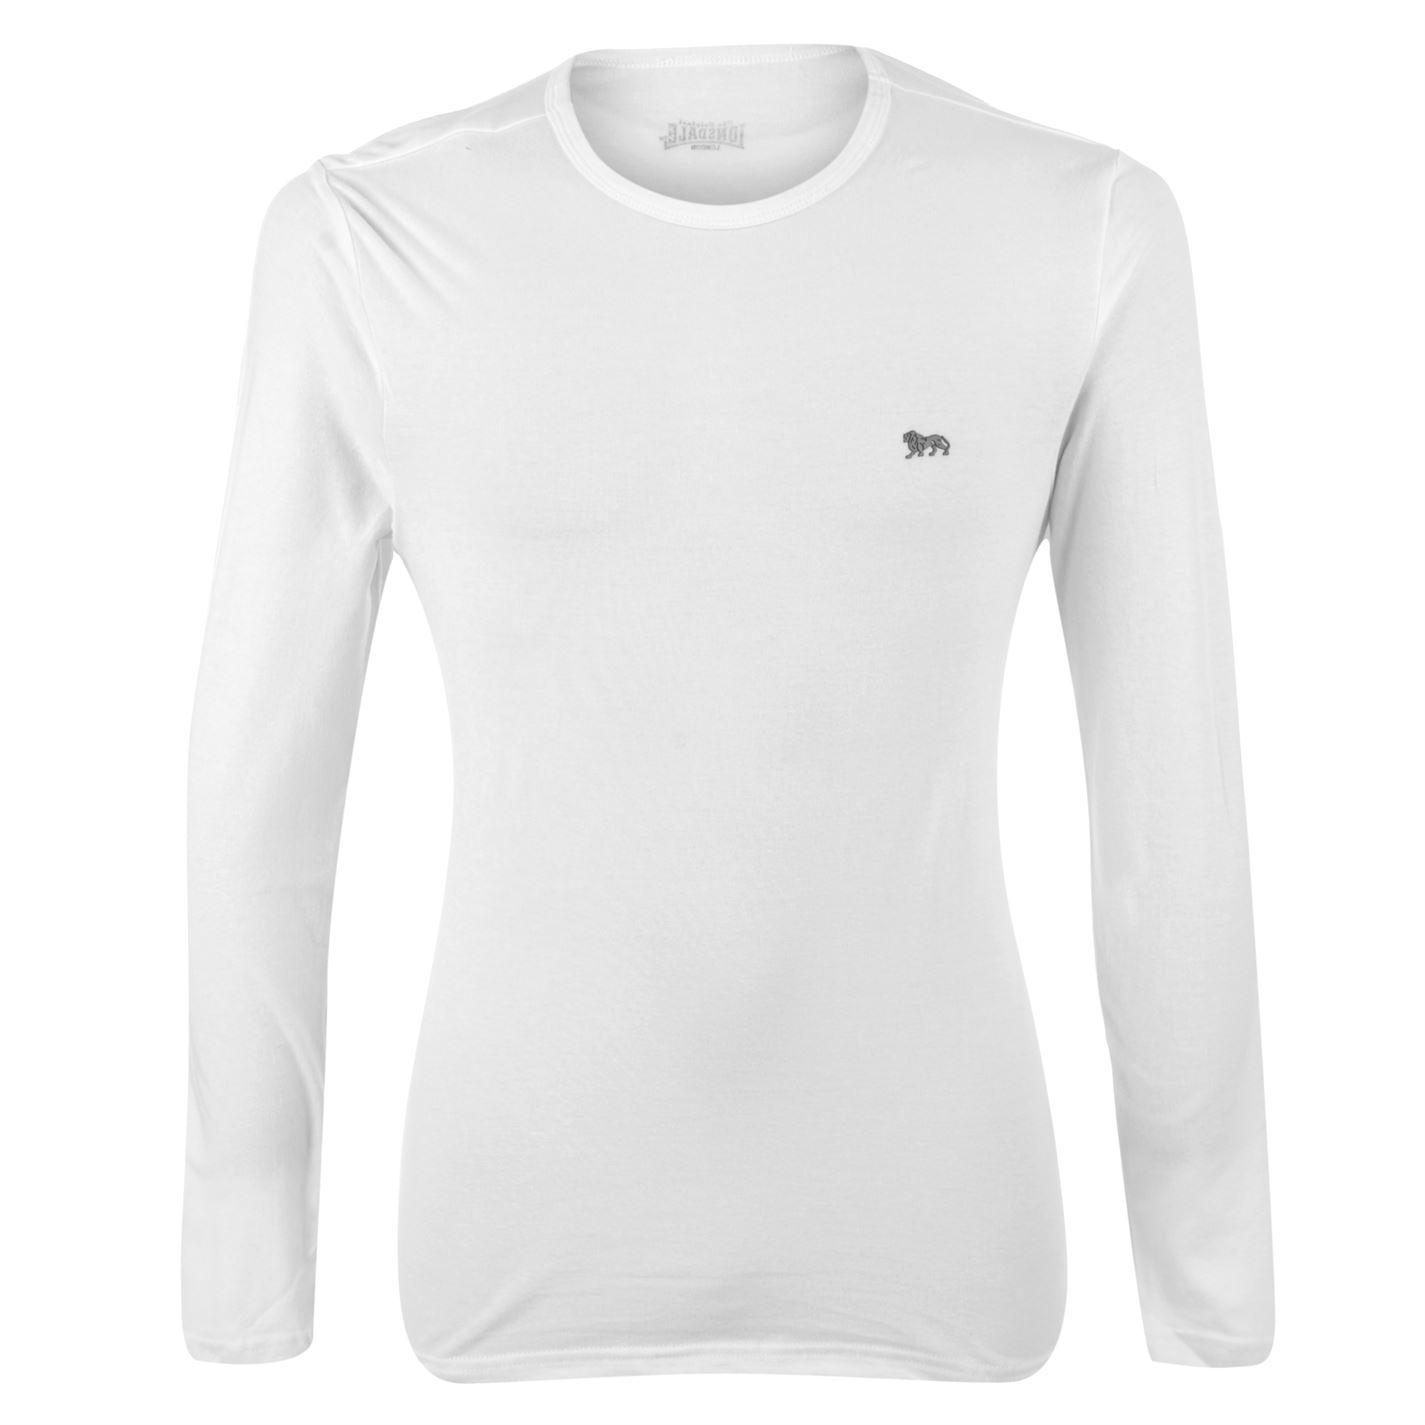 long sleeve t shirts image is loading lonsdale-long-sleeve-t-shirt-mens VWEYQUV